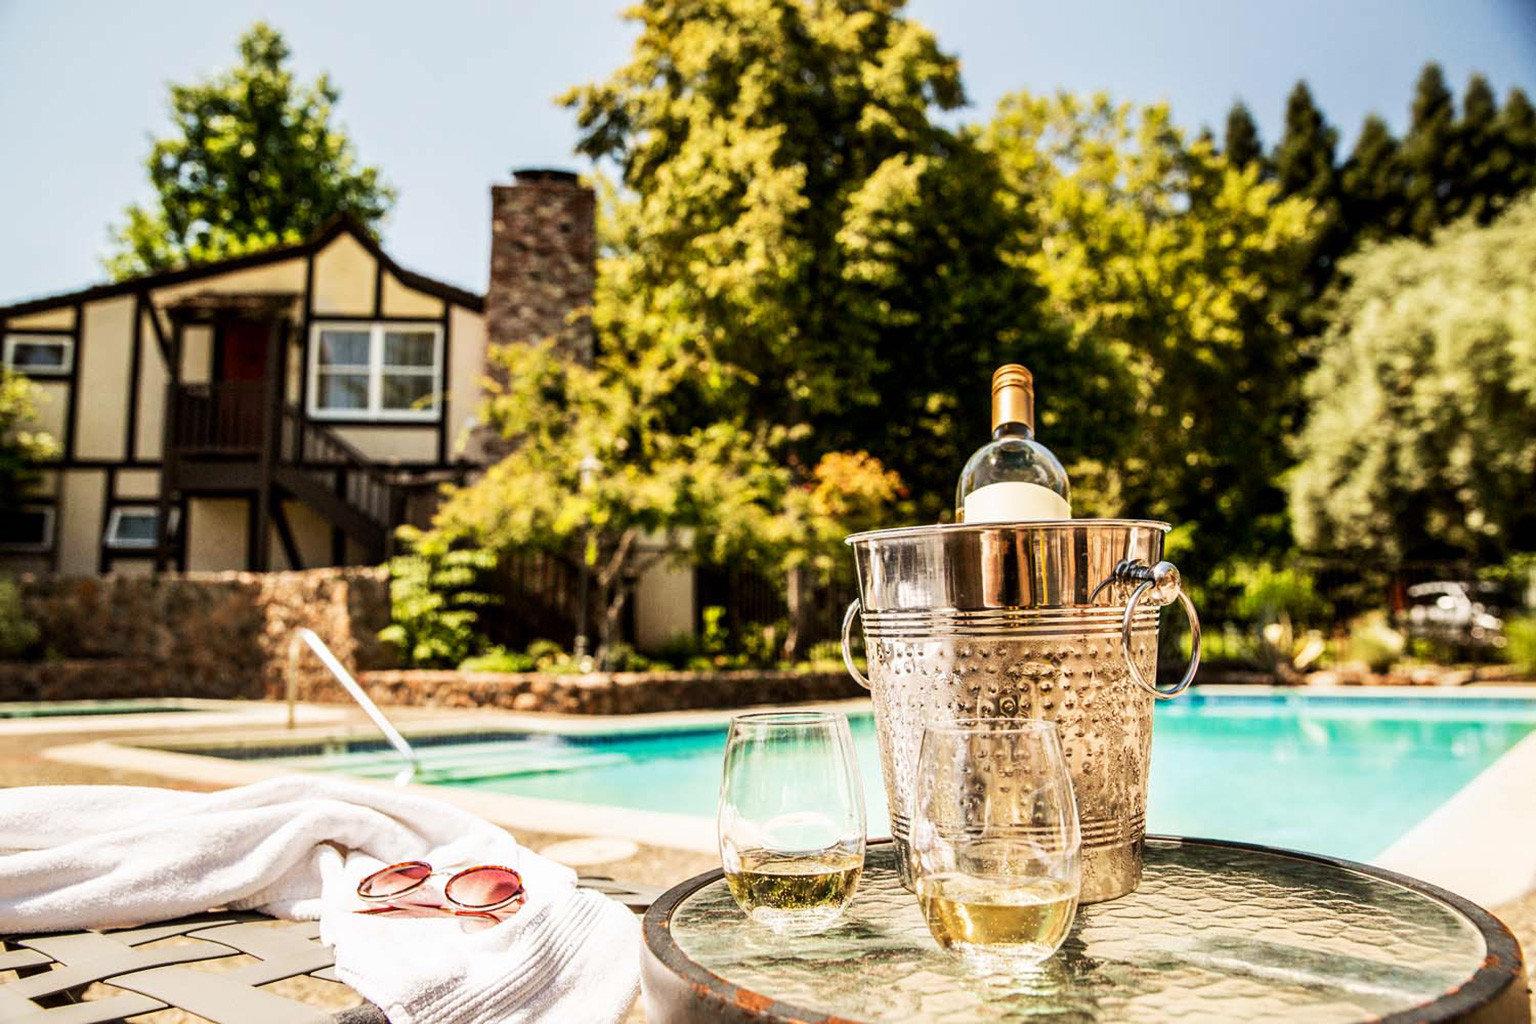 Drink Exterior Inn Patio Pool Romantic tree home lighting restaurant cottage backyard